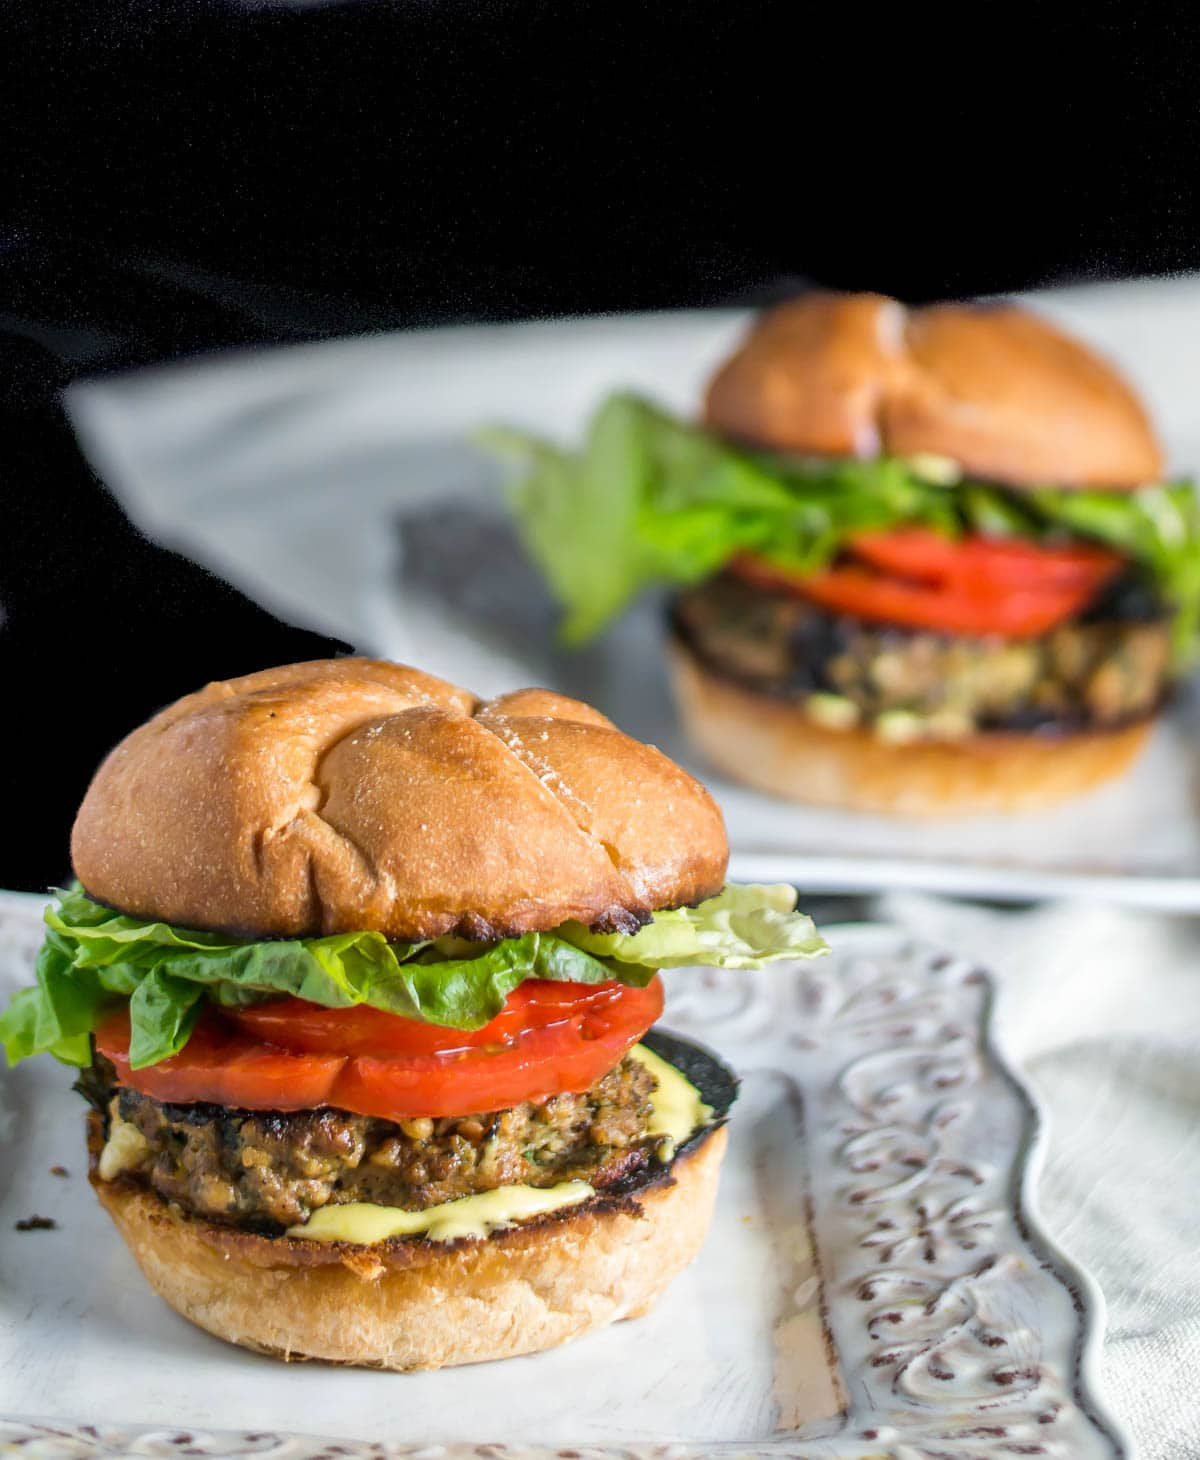 Super Healthy Turkey Burger With Blood Orange Aioli